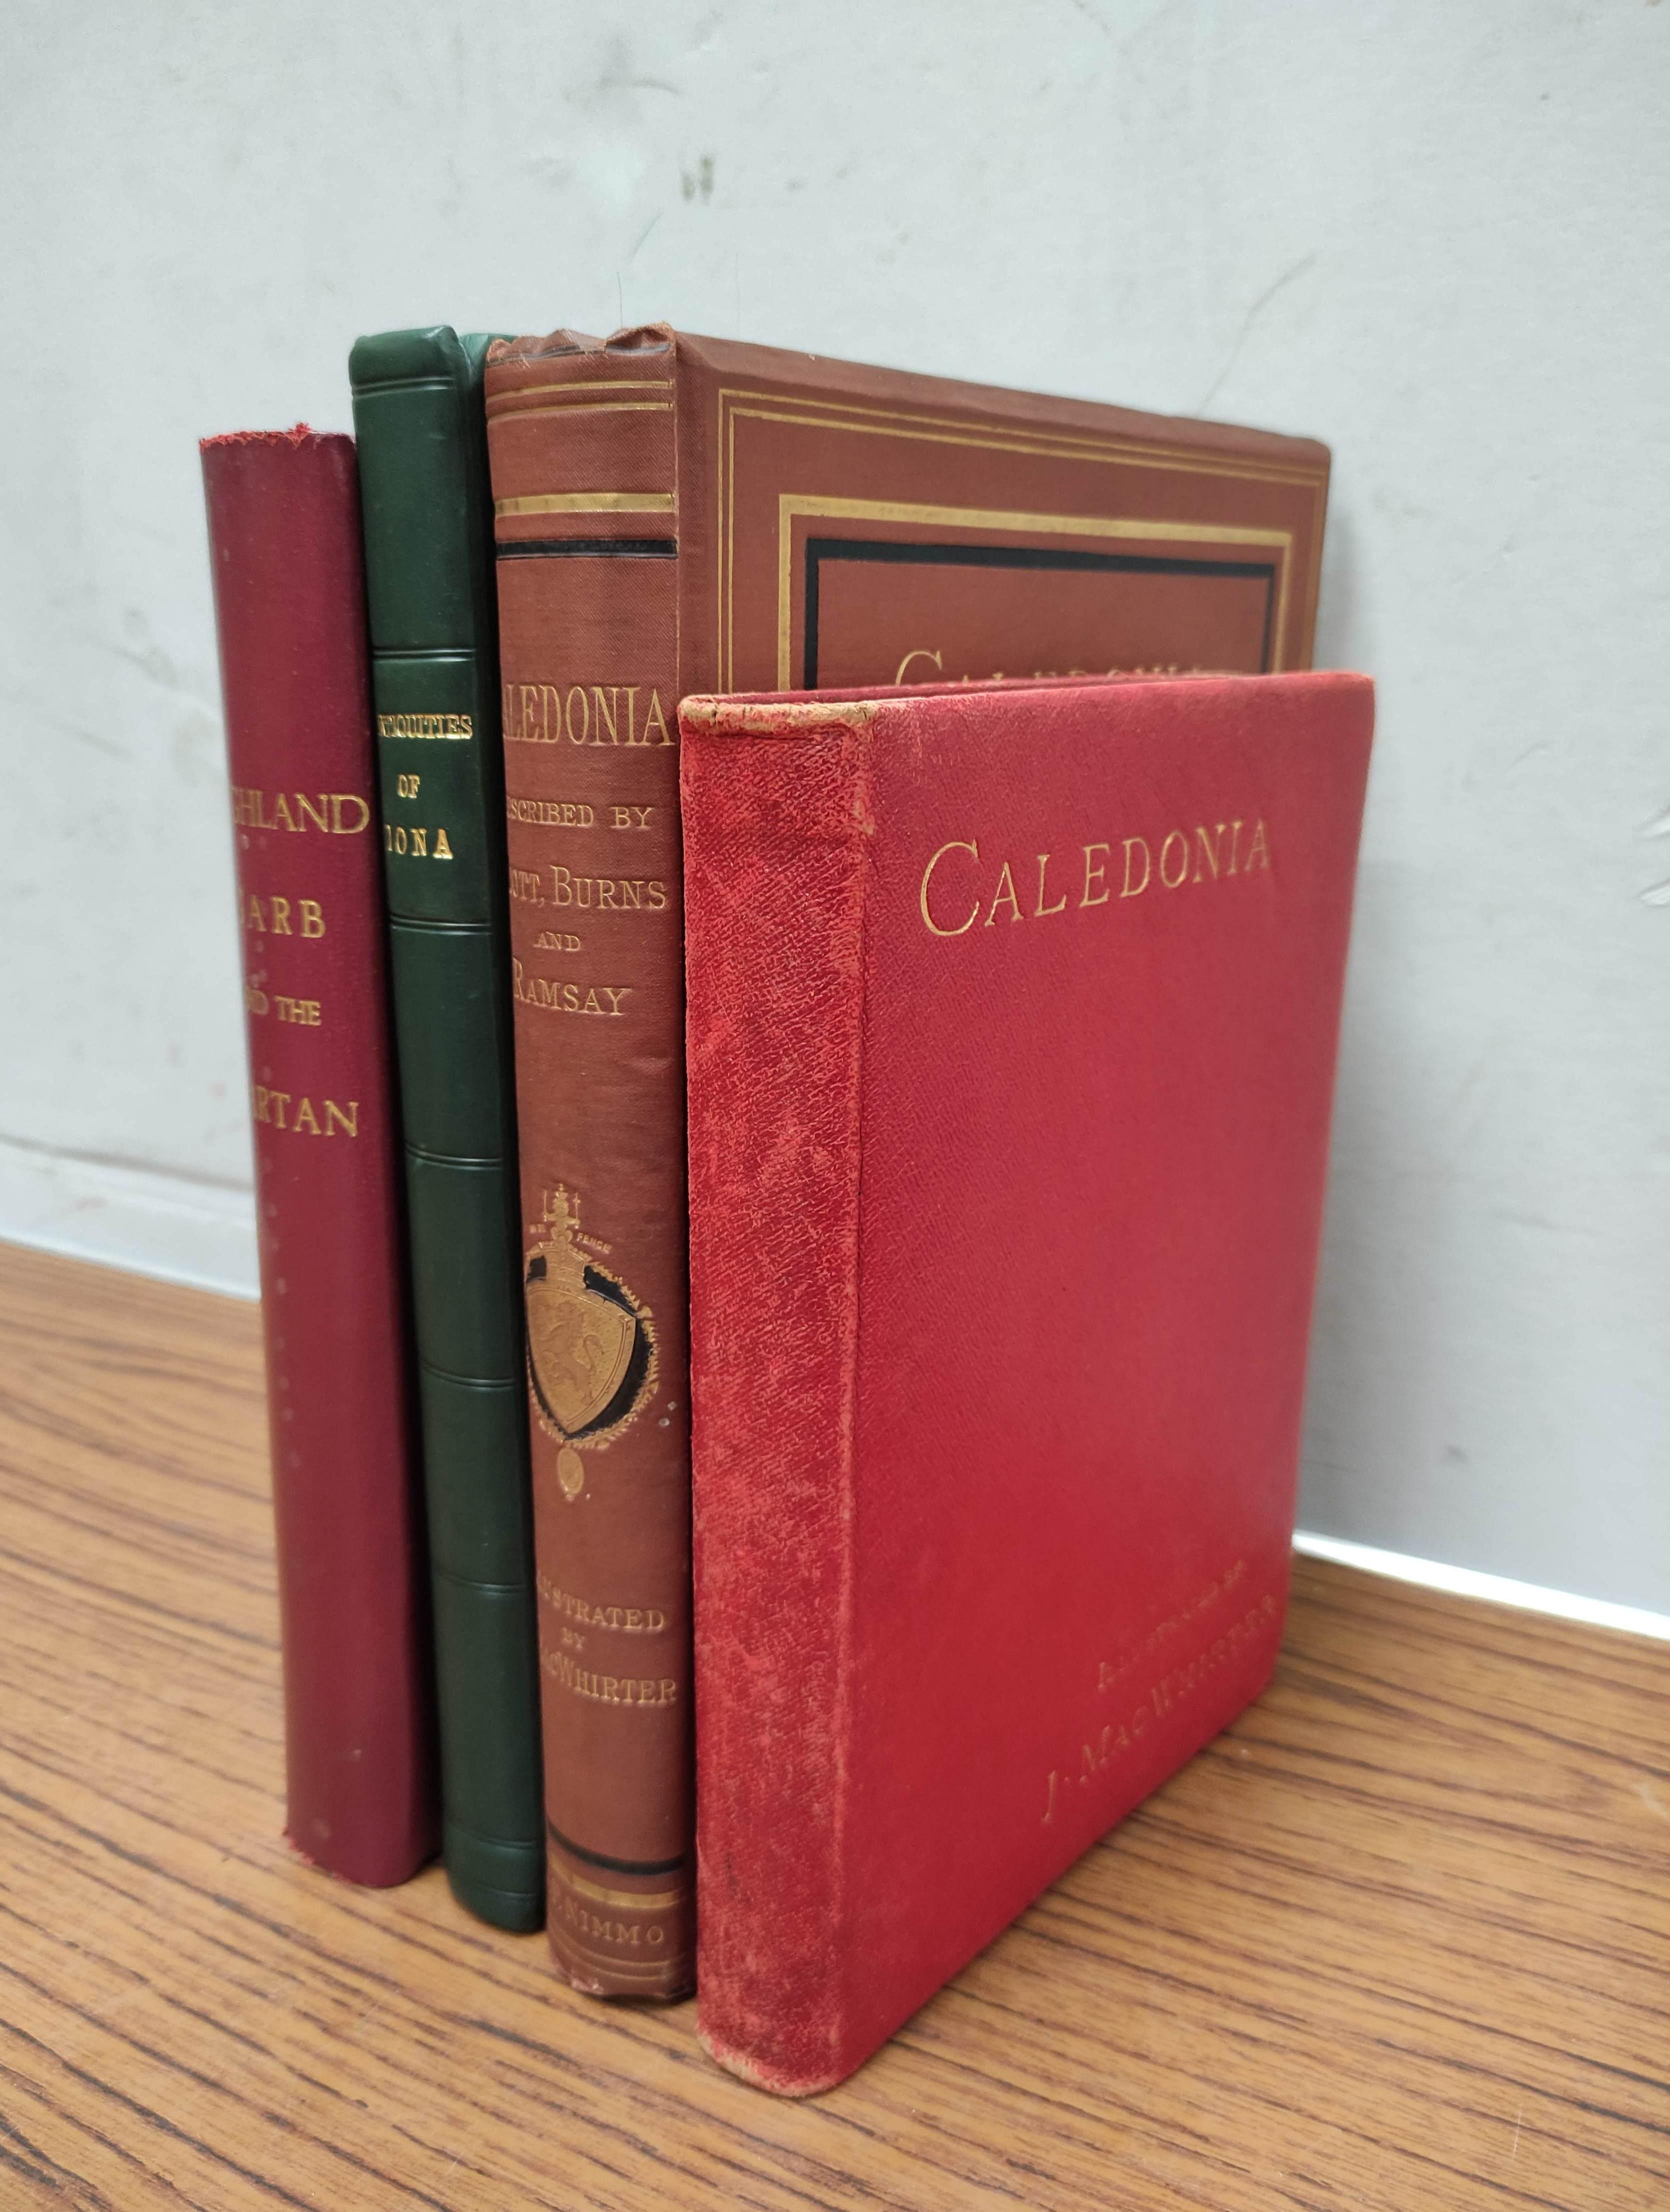 GRAHAM H. D.Antiquities of Iona. Litho frontis, map & plates. Quarto. Rebound qtr. green calf,